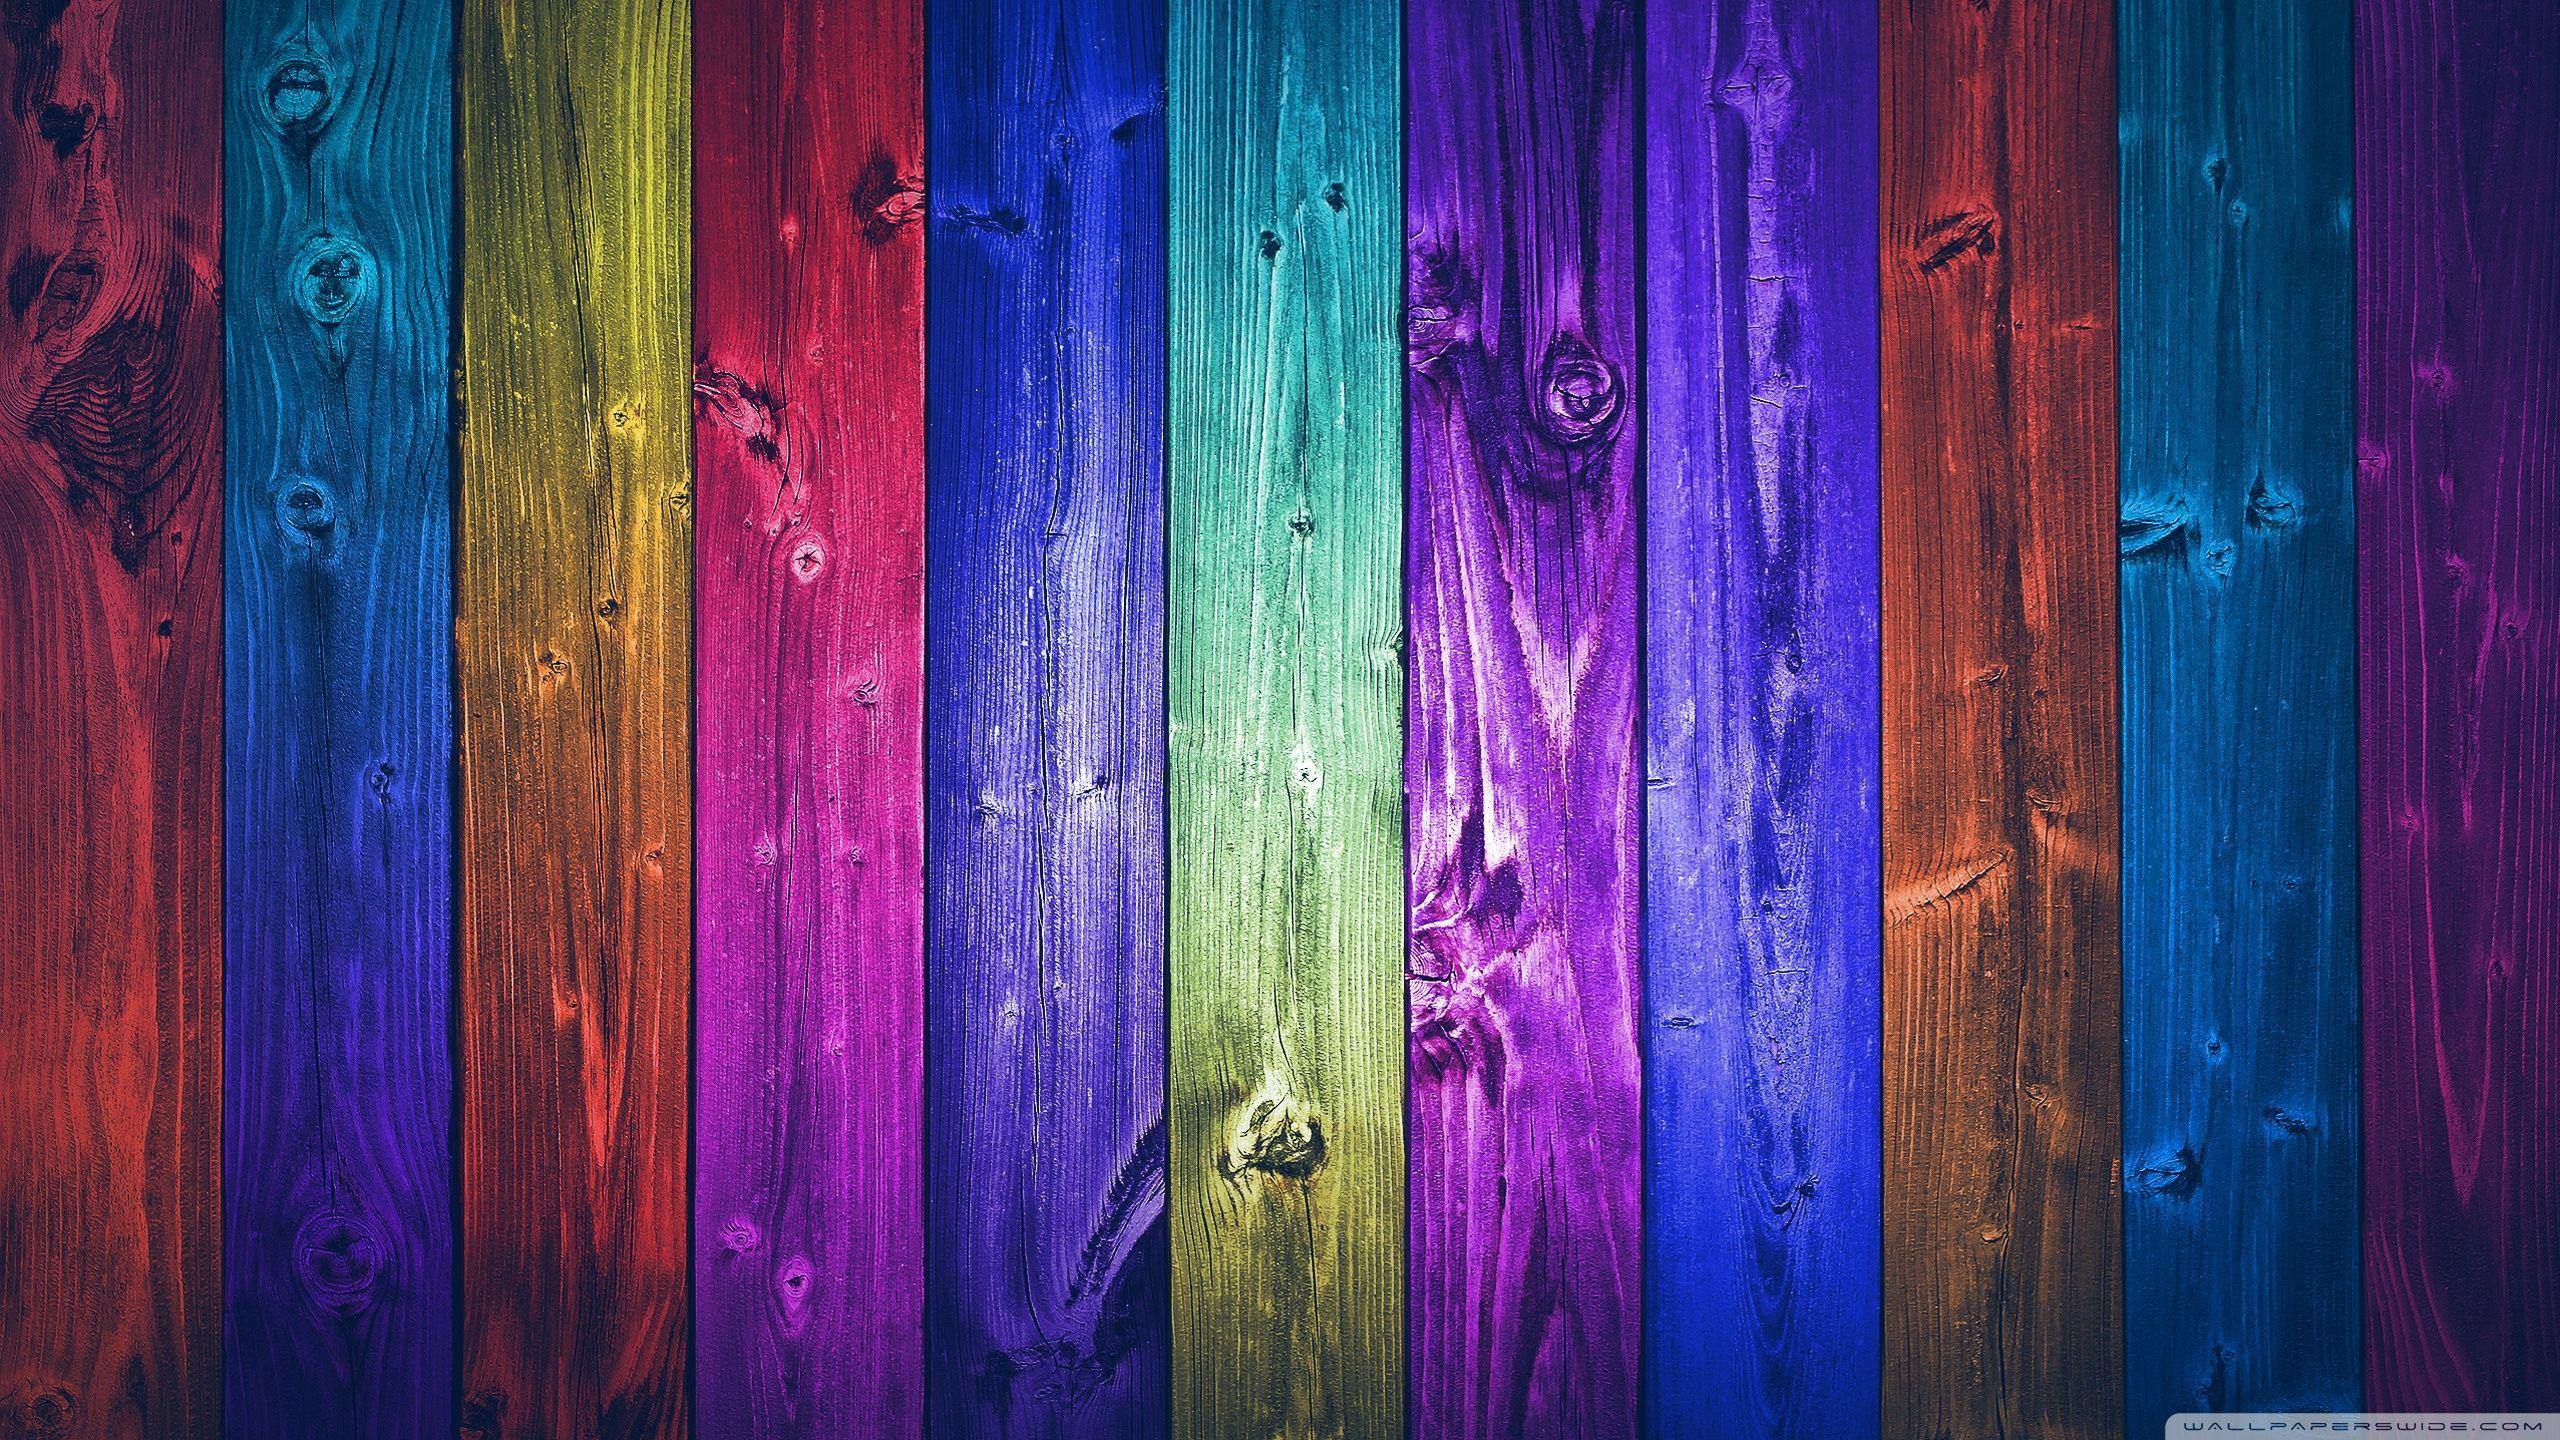 Colorful Desktop Wallpapers Top Free Colorful Desktop Backgrounds Wallpaperaccess